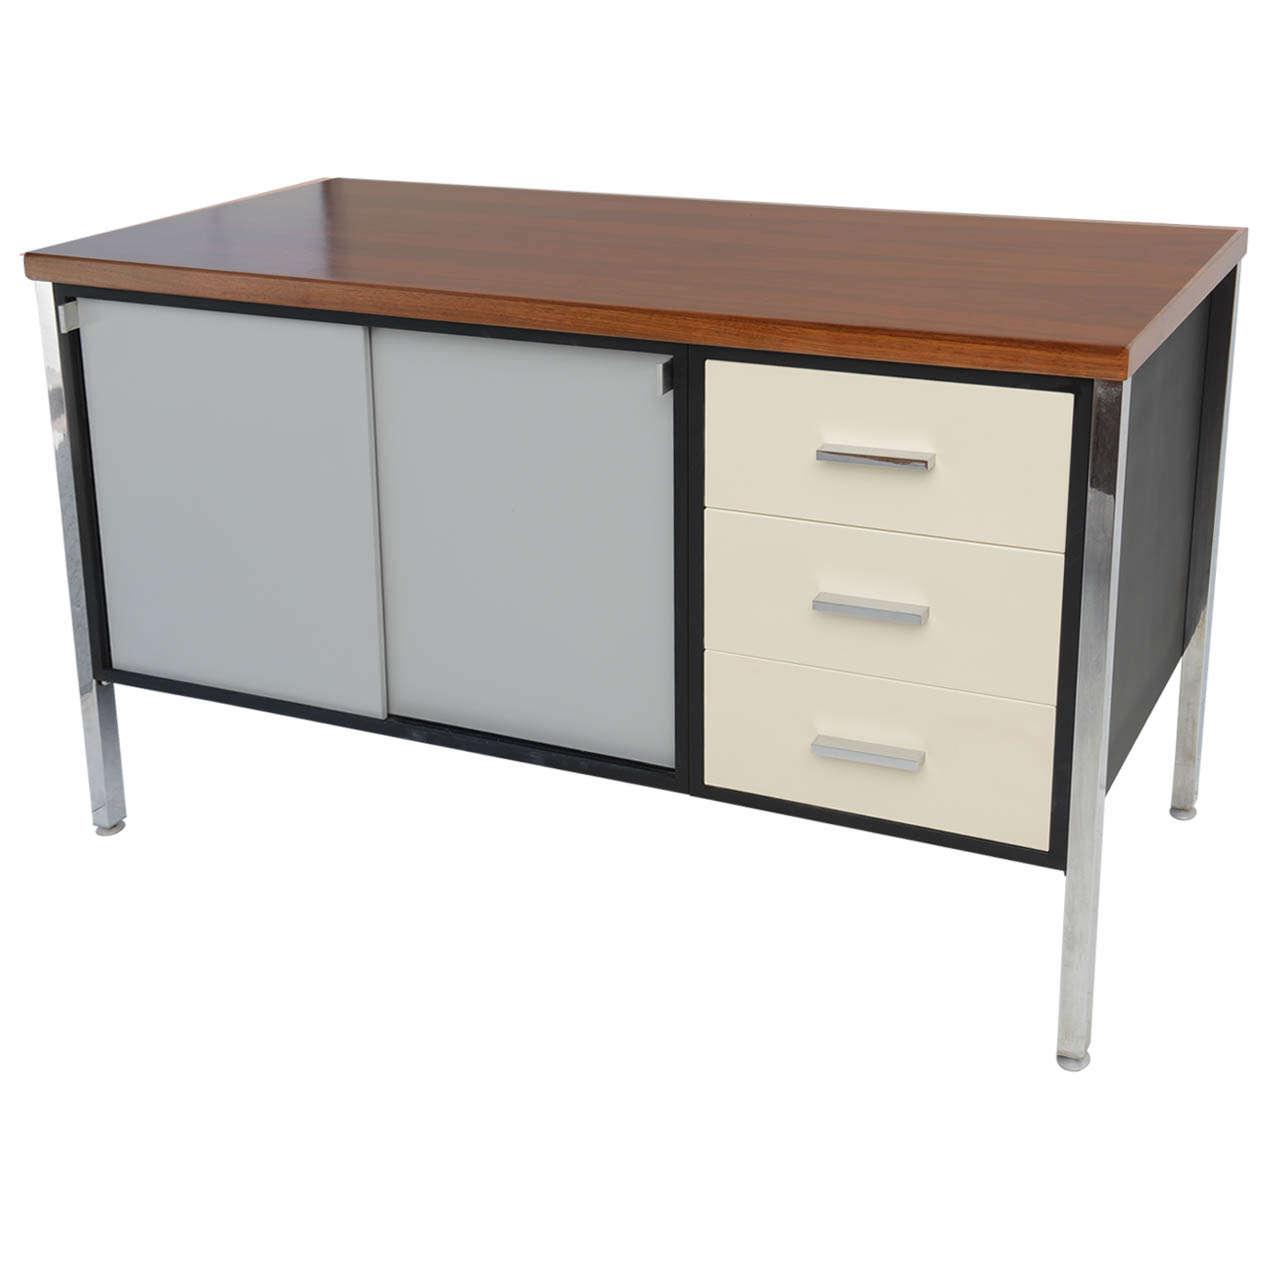 Mid century modern art metal for knoll credenza office for Modern office credenza furniture